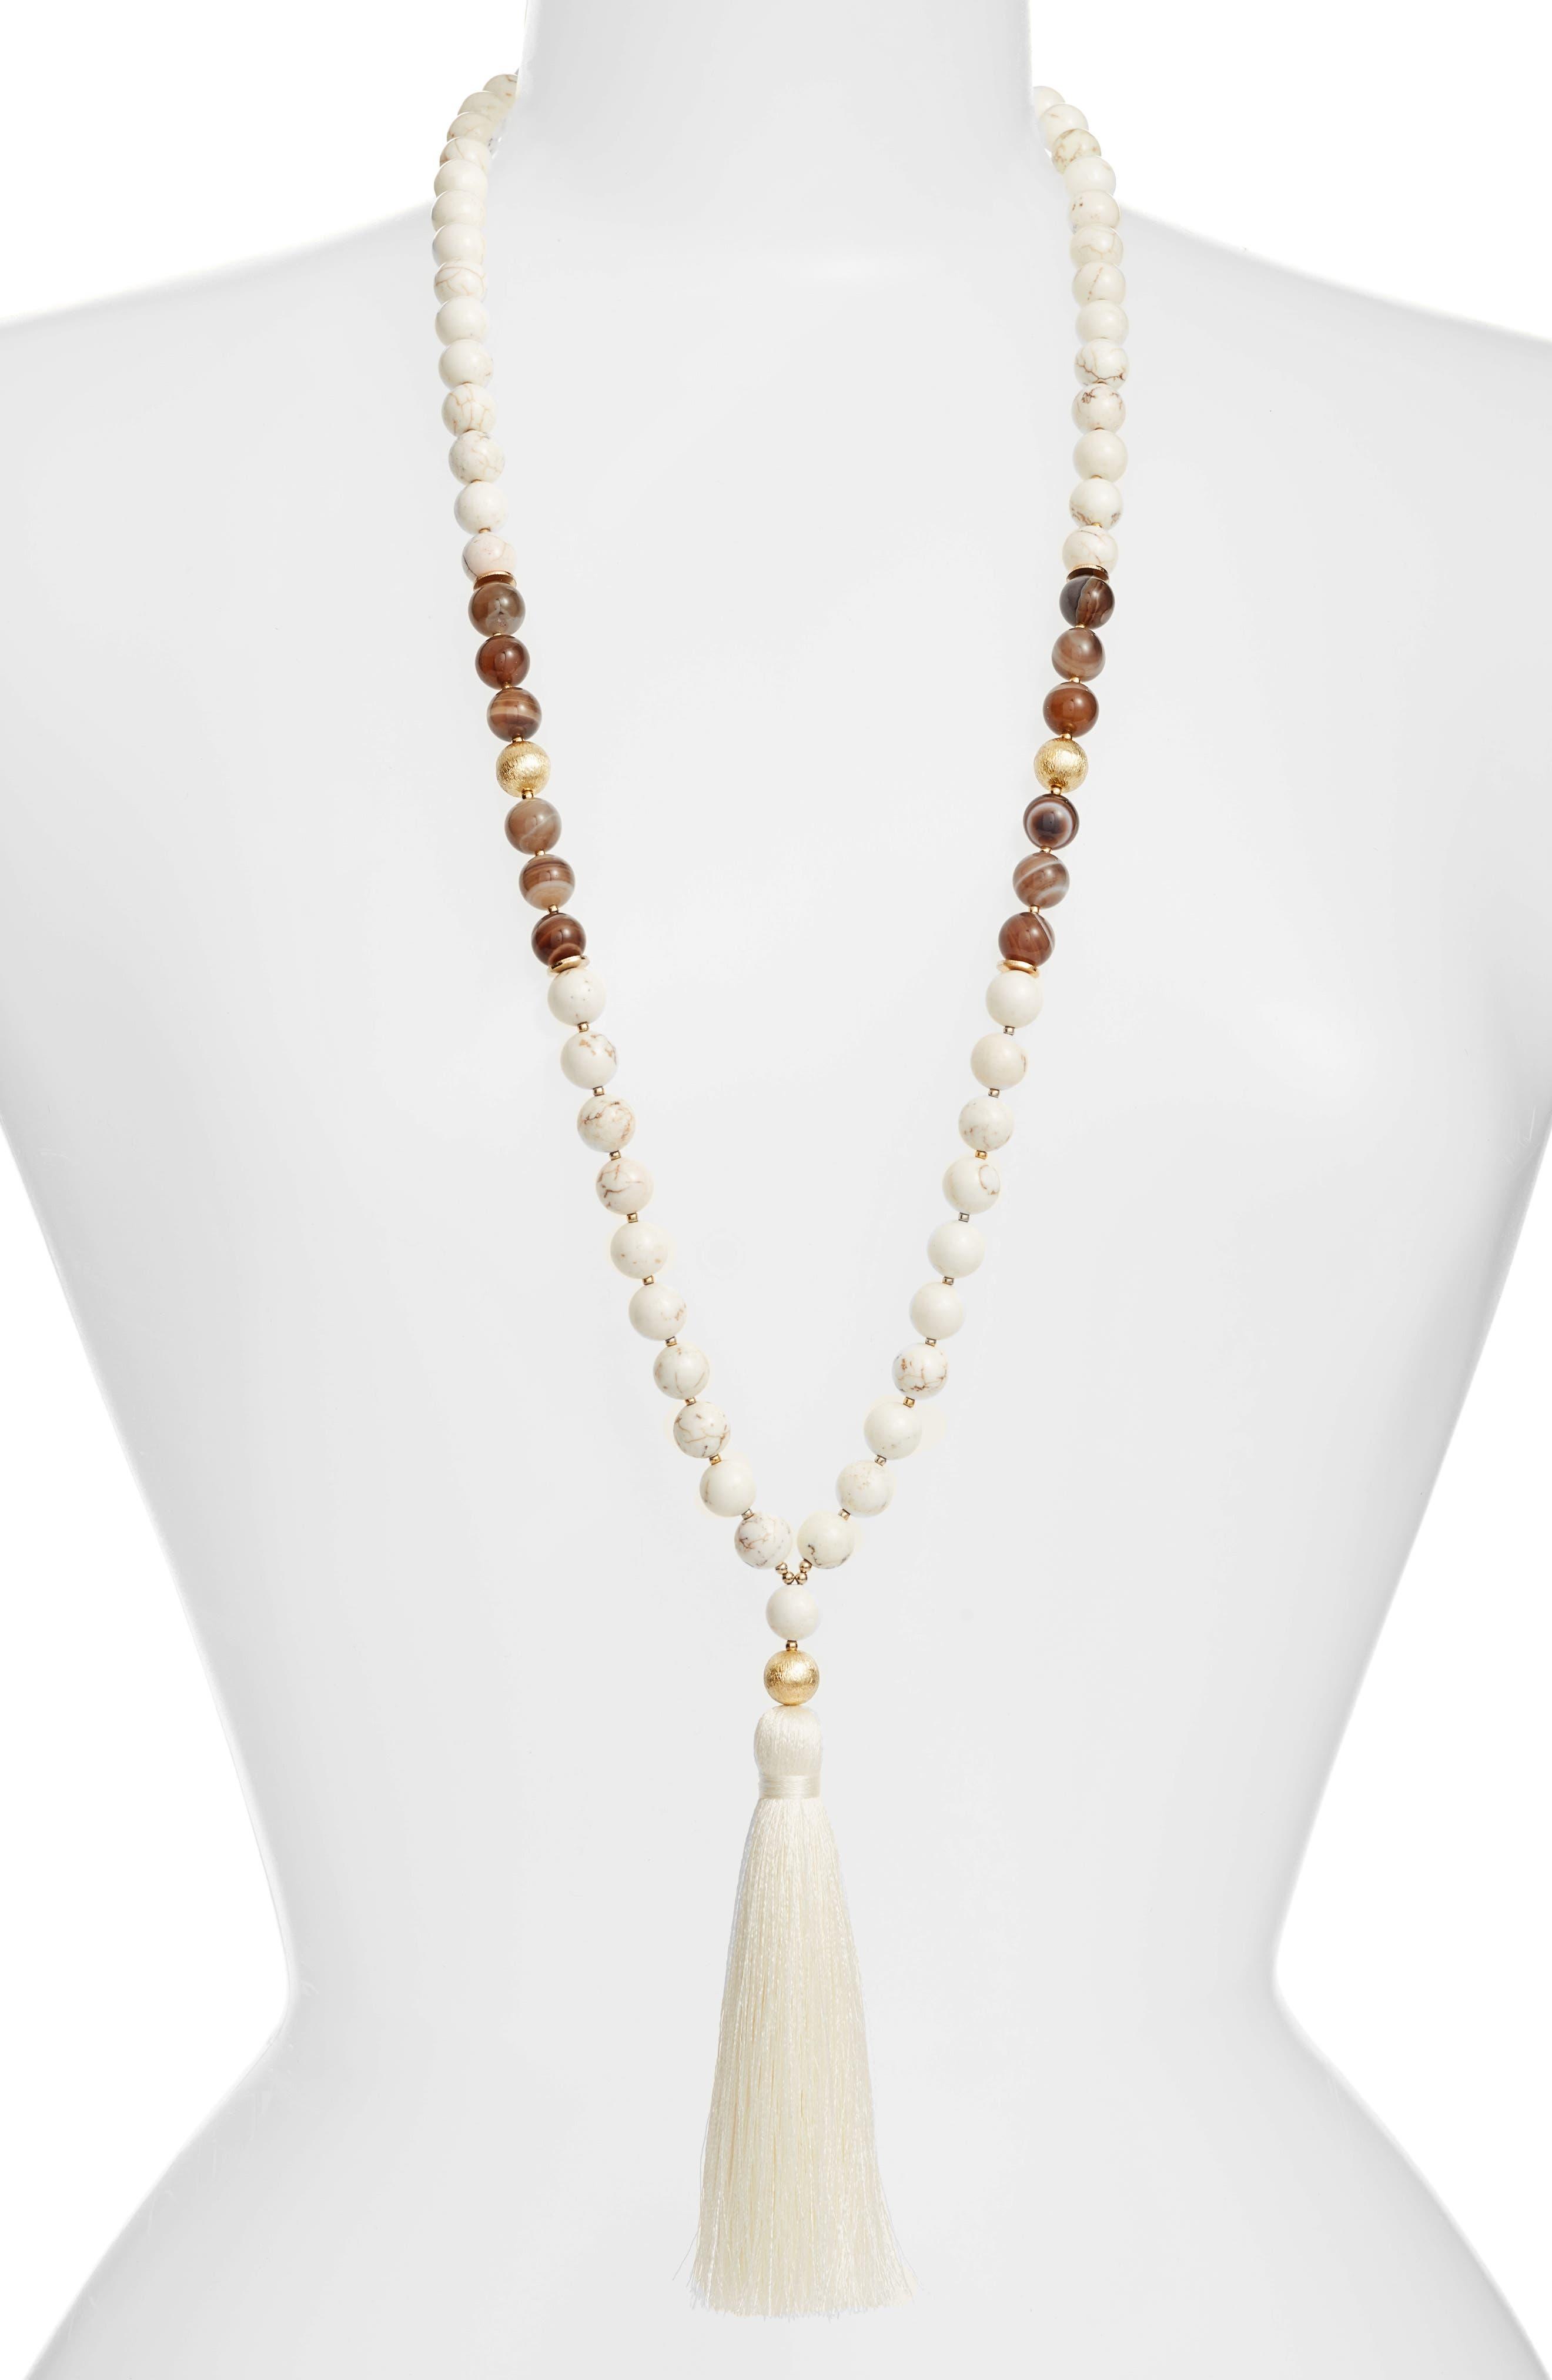 Main Image - Love's Affect Elle Semiprecious Stone Tassel Necklace